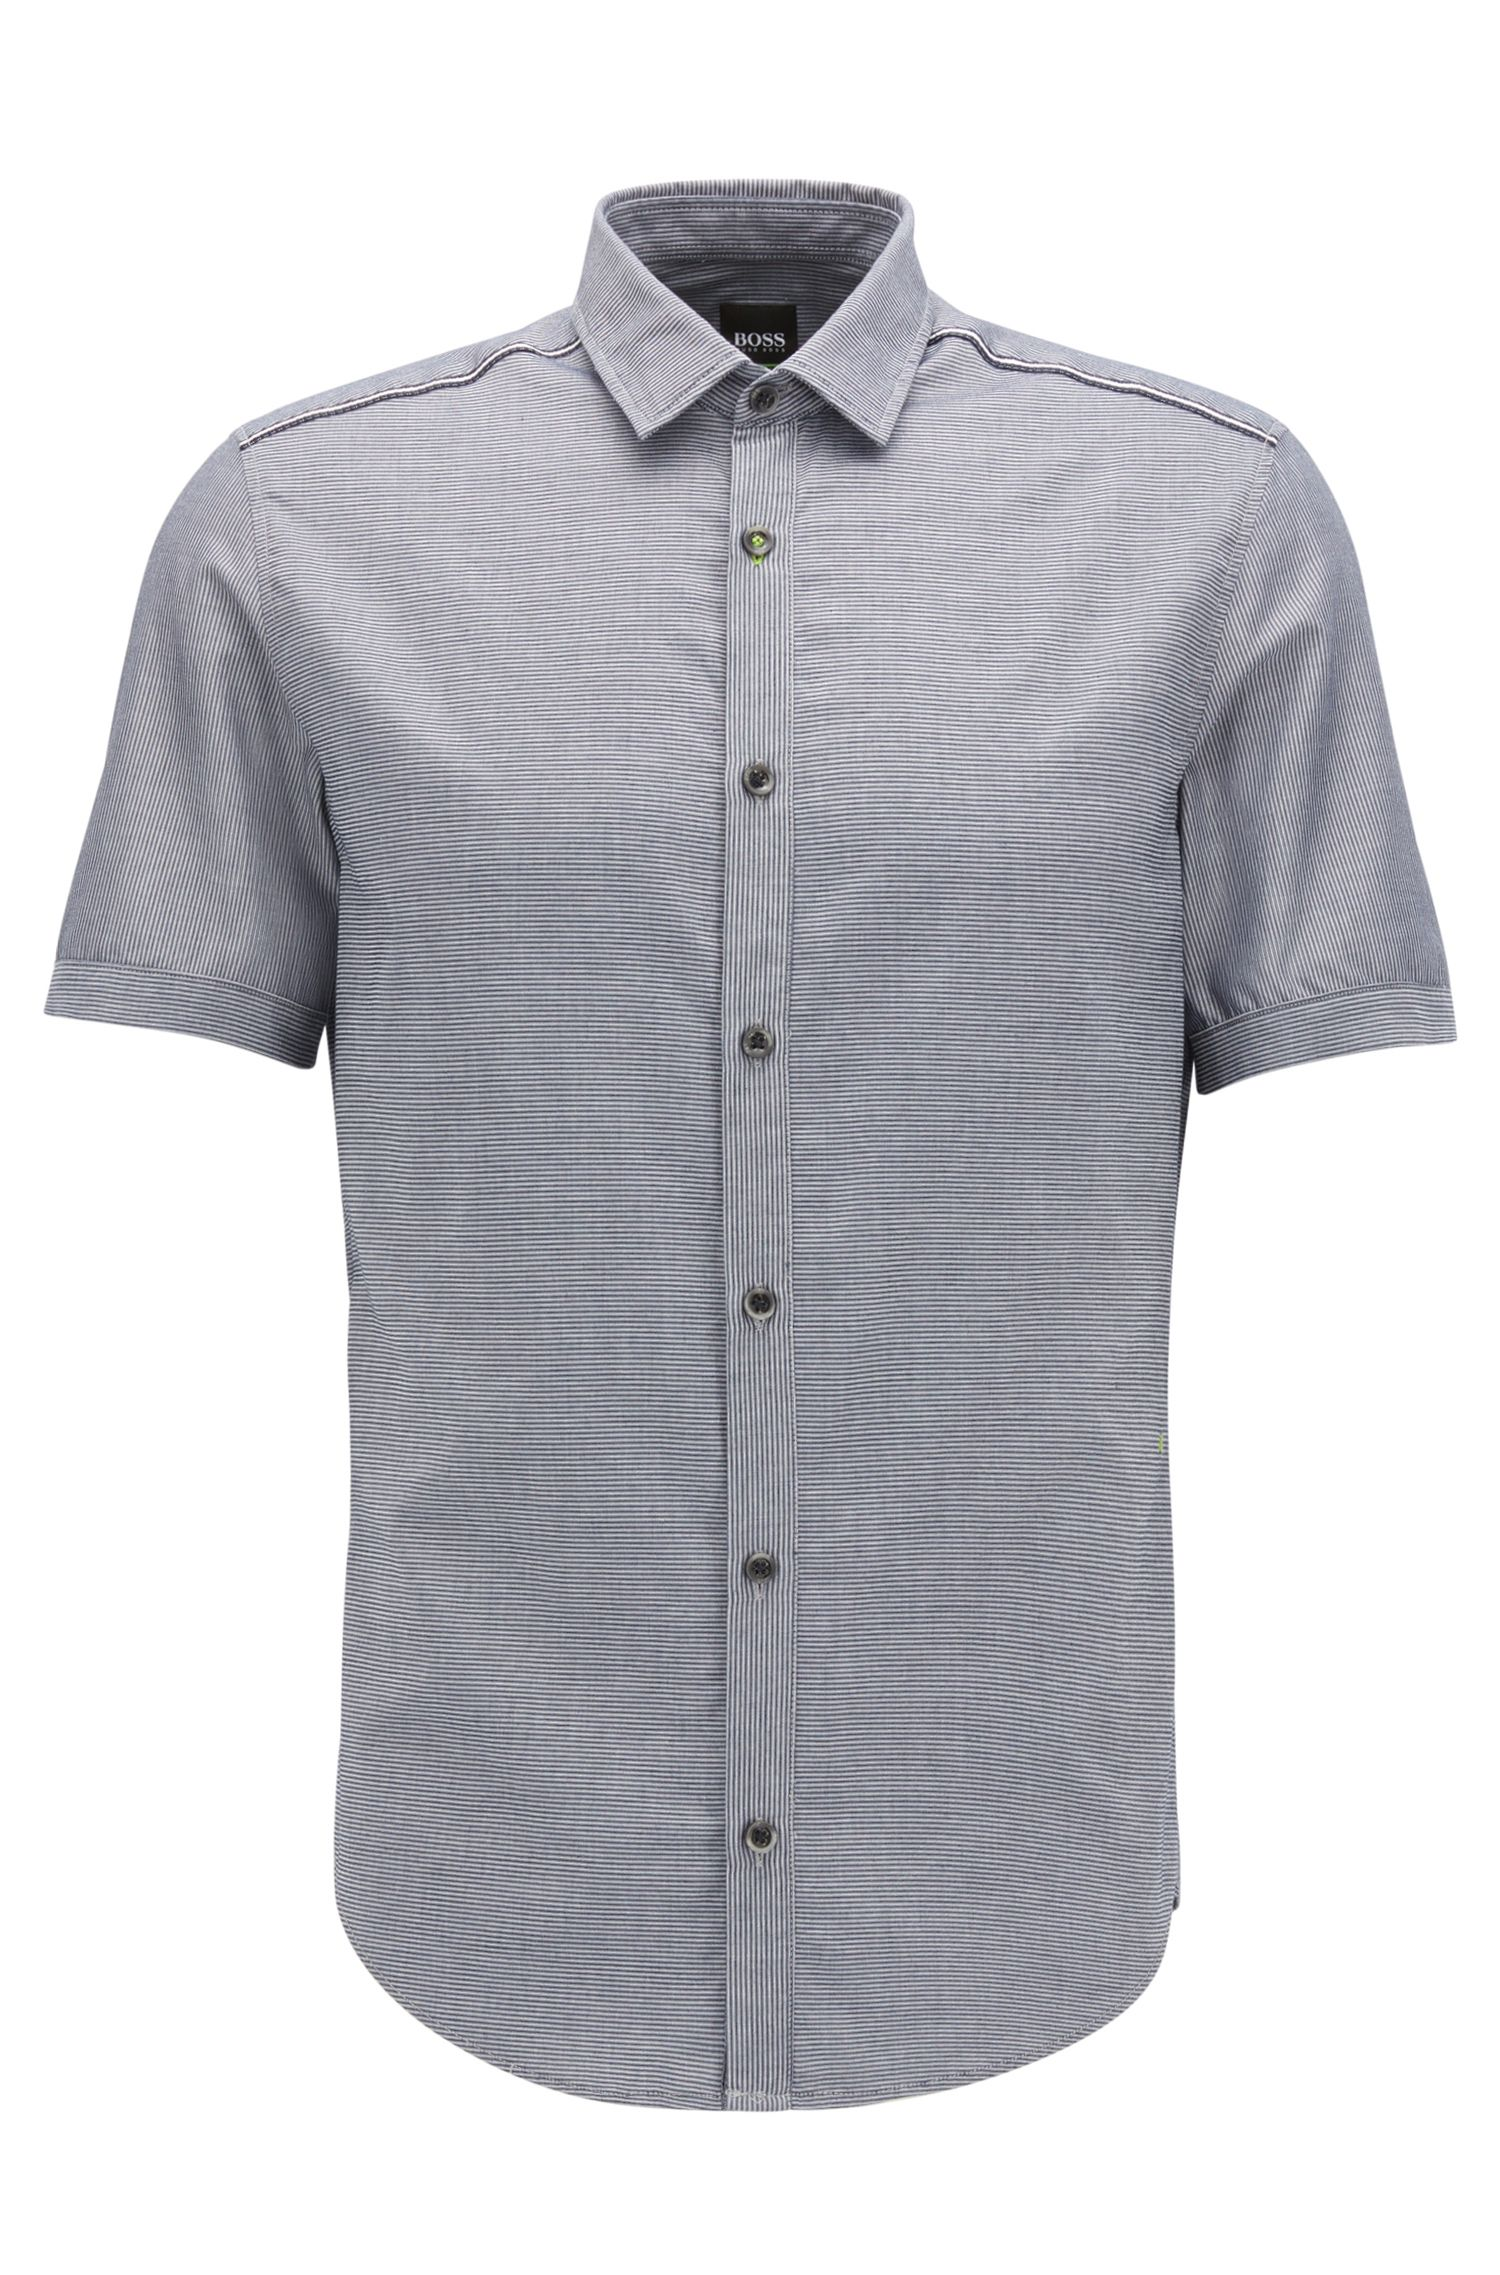 Slim-fit shirt in moisture-management cotton